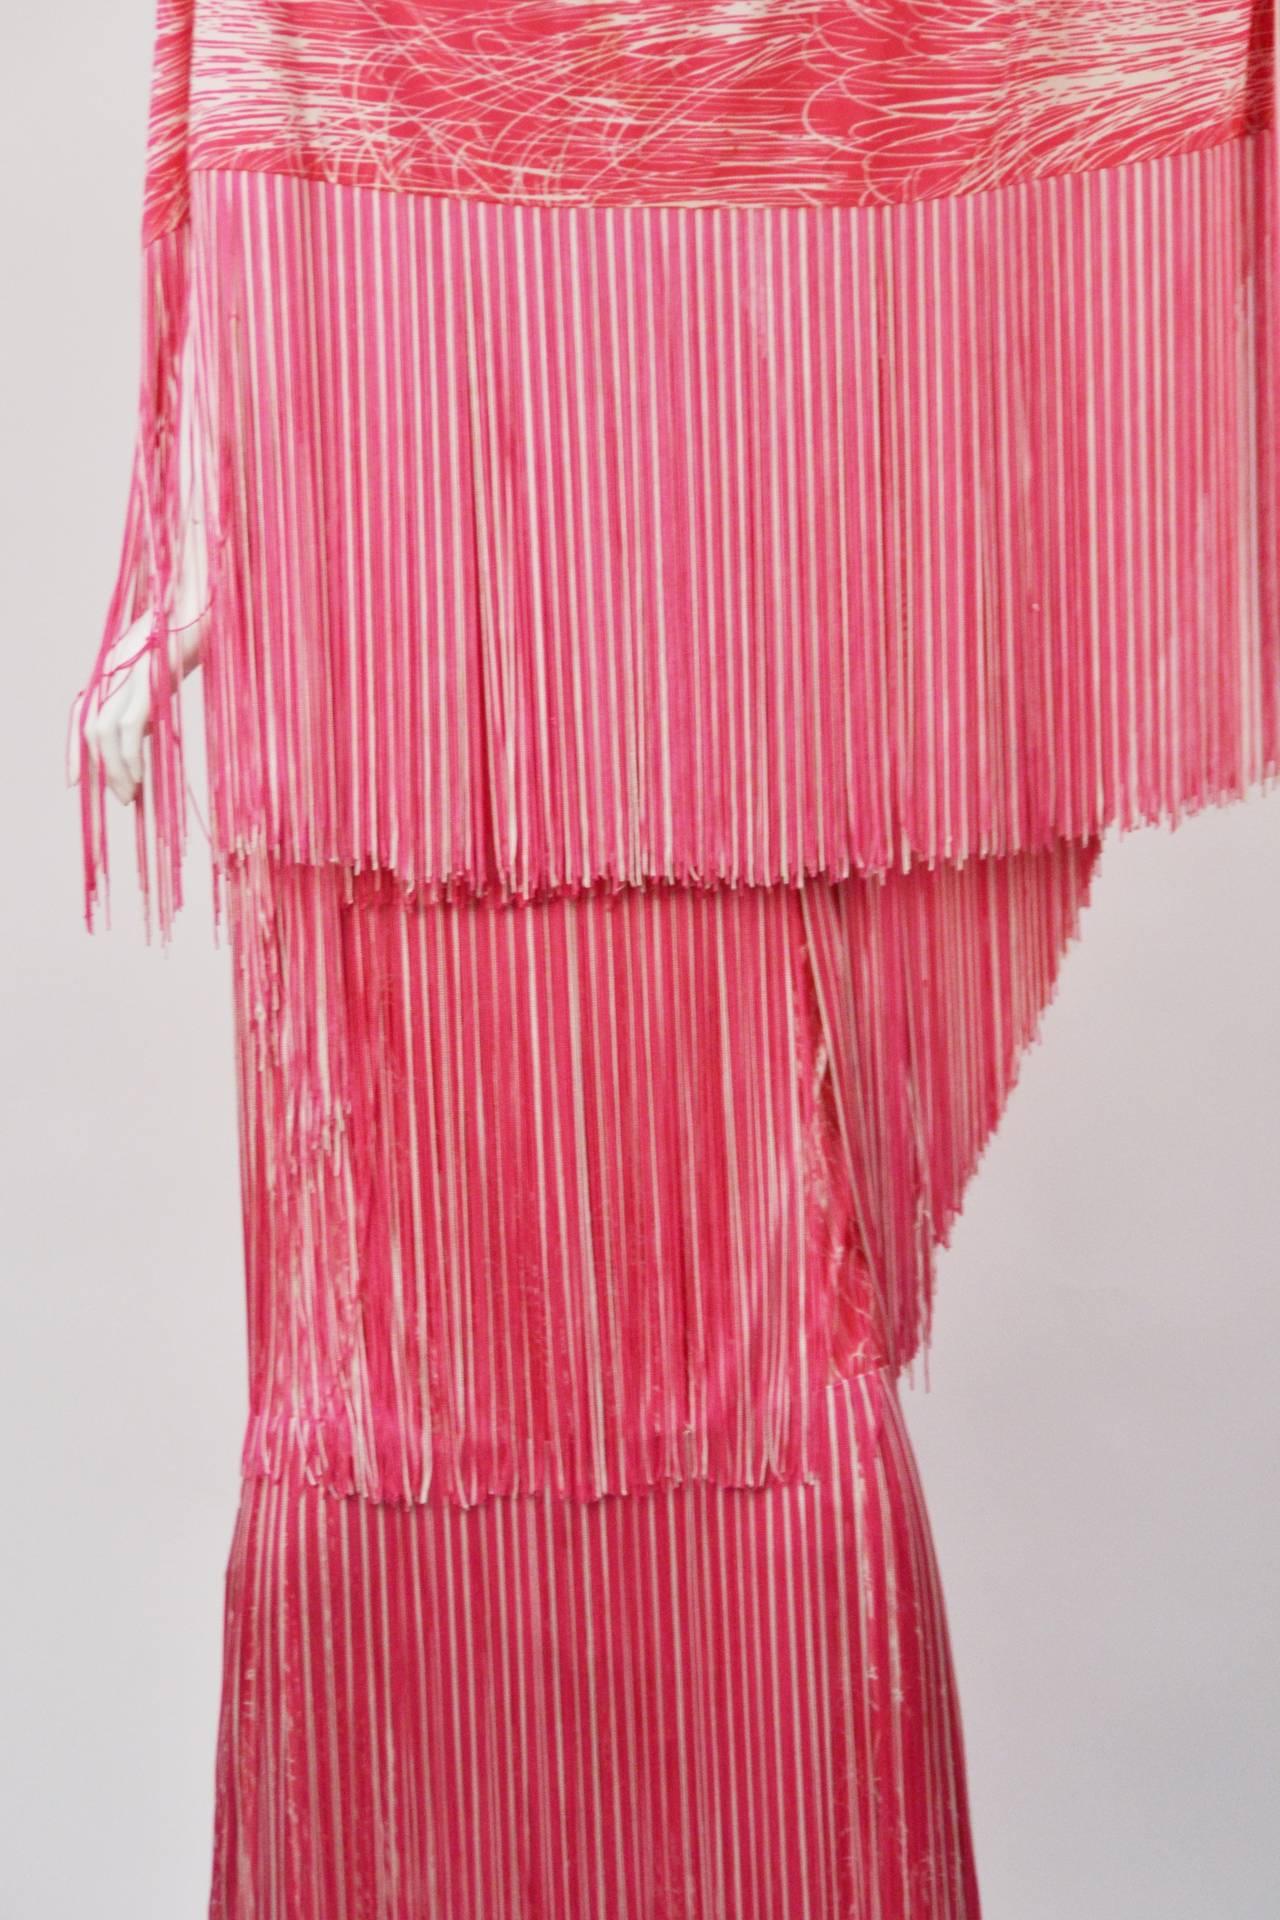 1970s Lilli Diamond Pink and White Fringe Halter Dress and Shawl 2